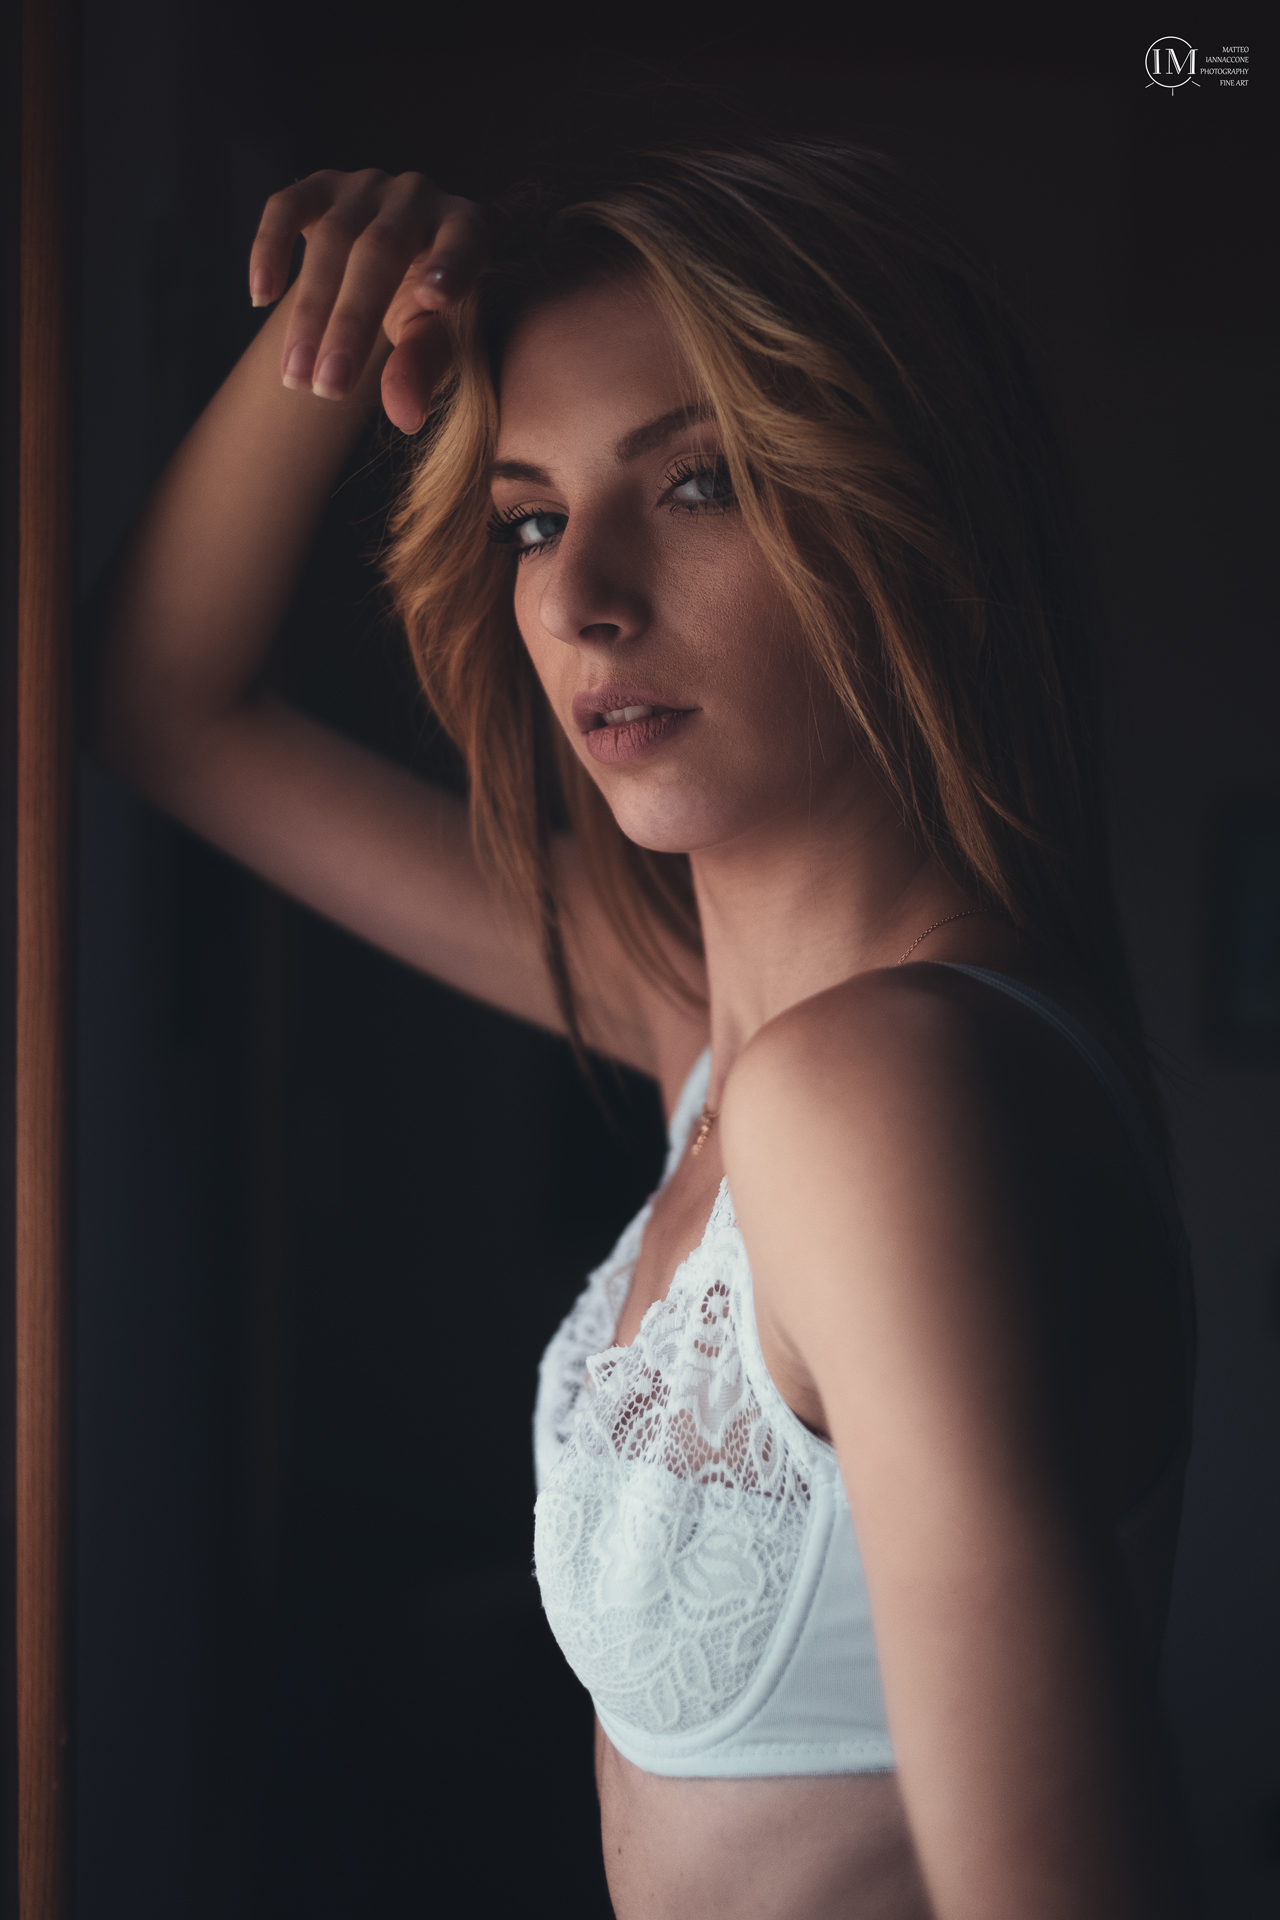 Categorie: Boudoir & Nude, Glamour, Portrait - Photographer: MATTEO IANNACONE - Models: TIZIANA MUSIARI, LETIZIA REVERBERI - Location: Reggio Emilia, RE, Italia